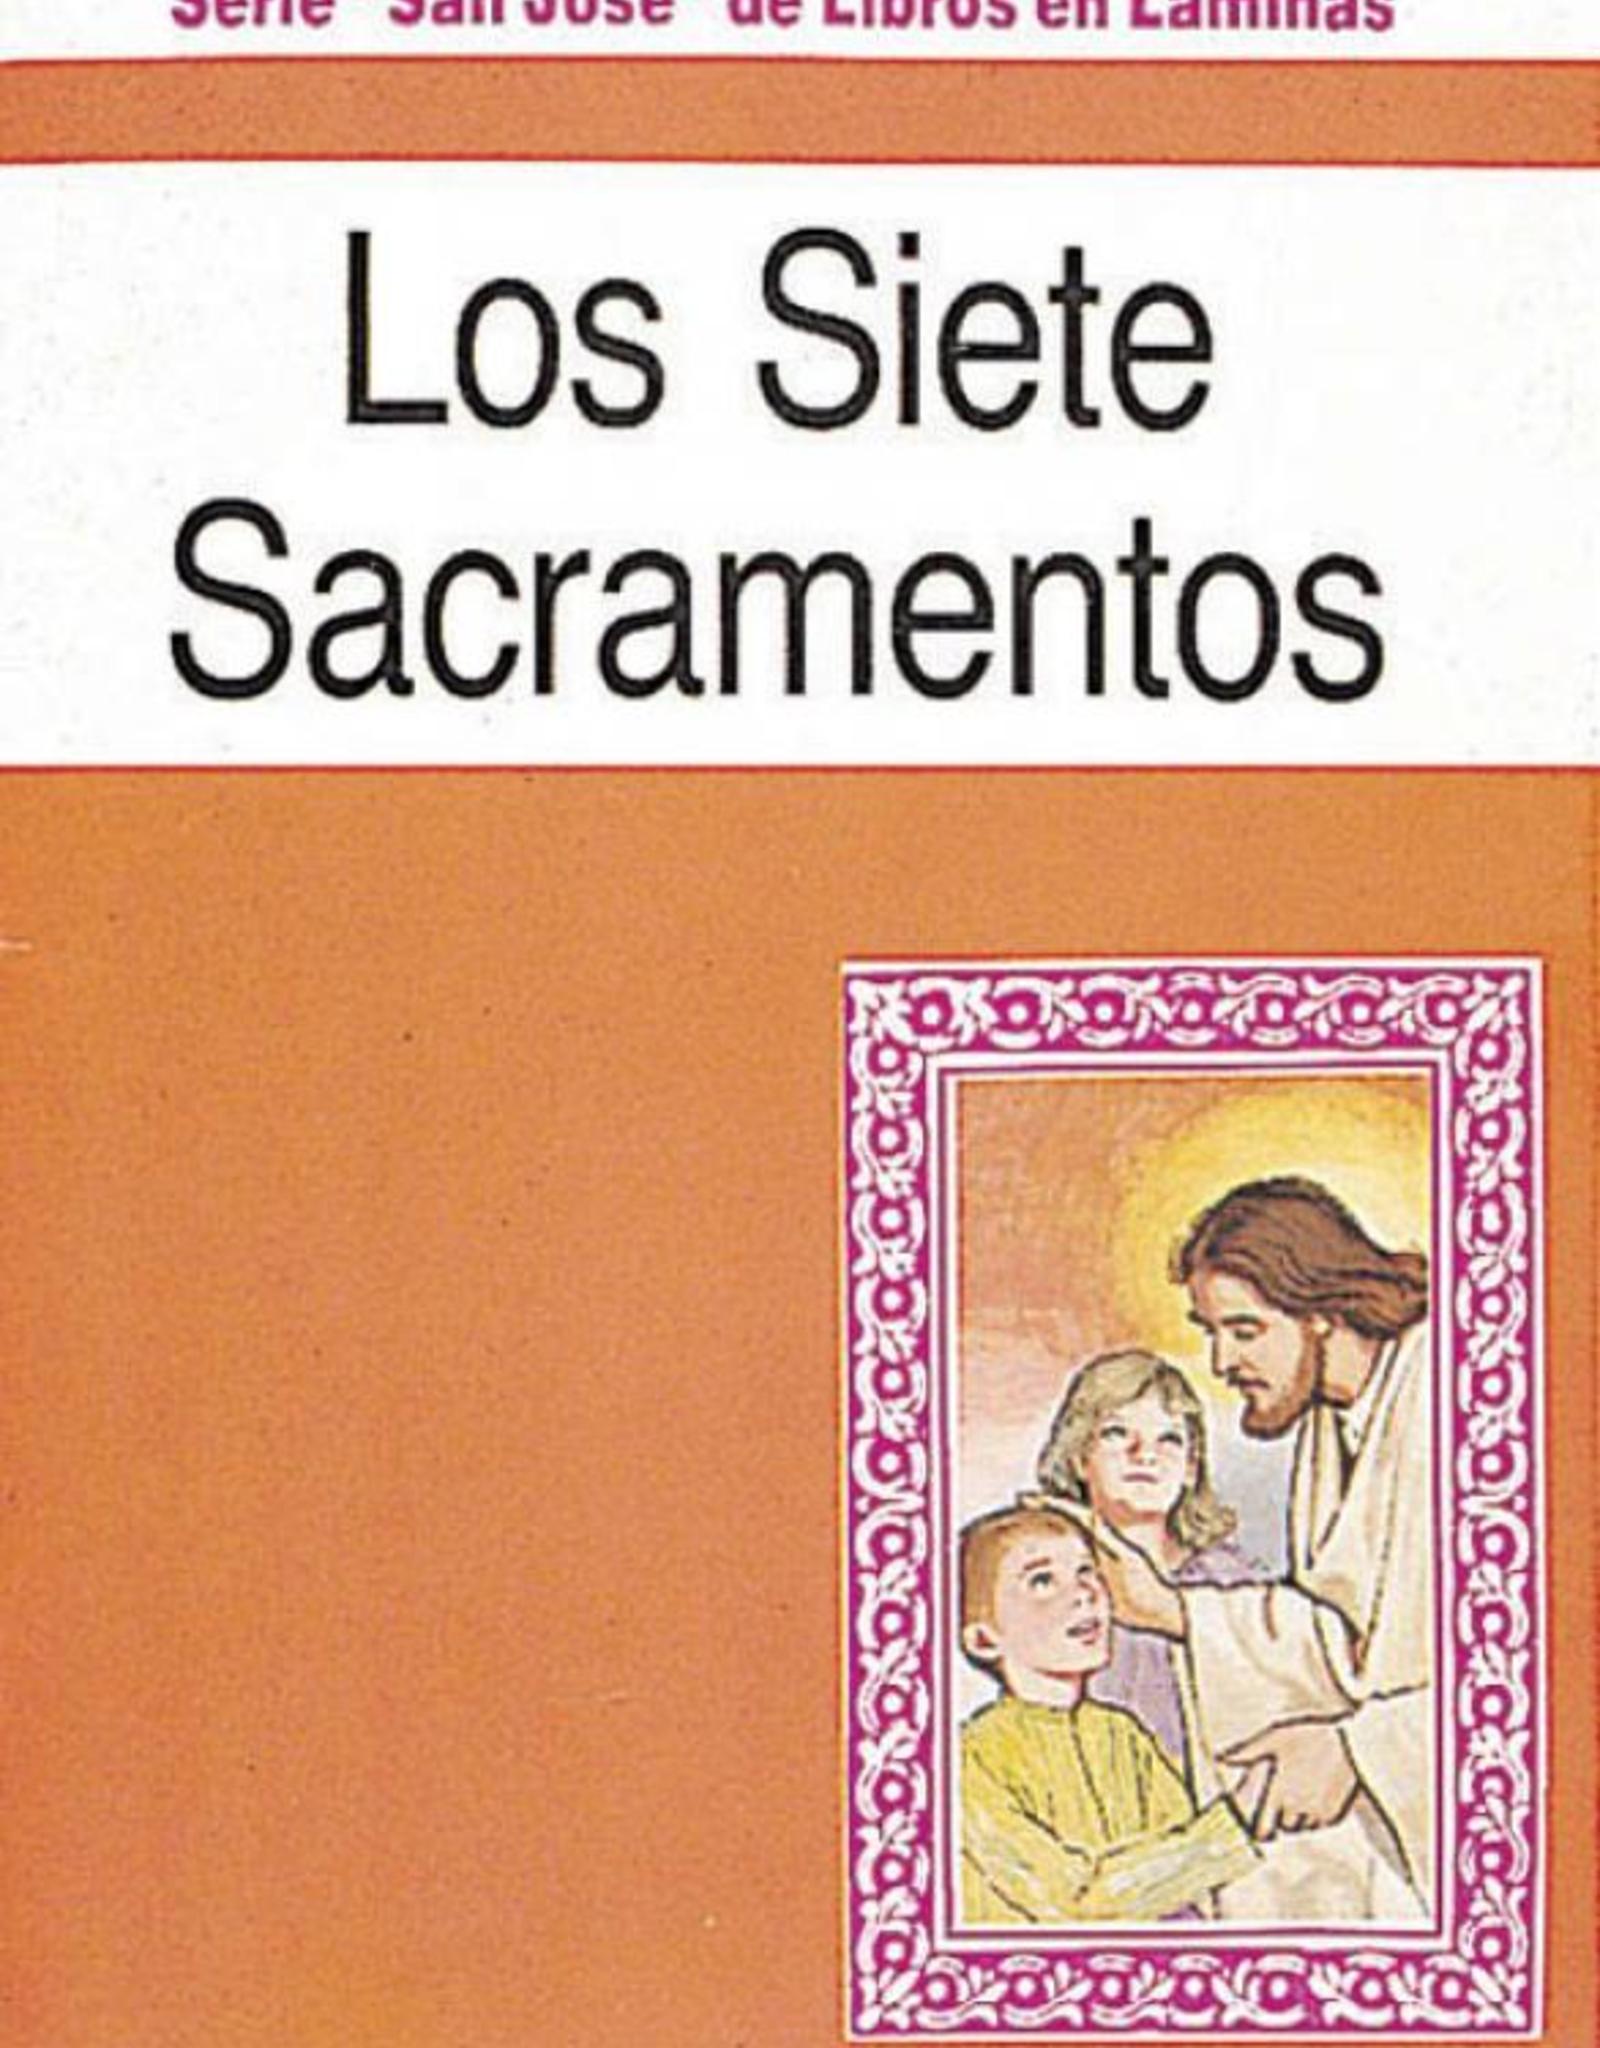 Catholic Book Publishing Los Siete Sacramentos, Padre Lorenzo Lovasik